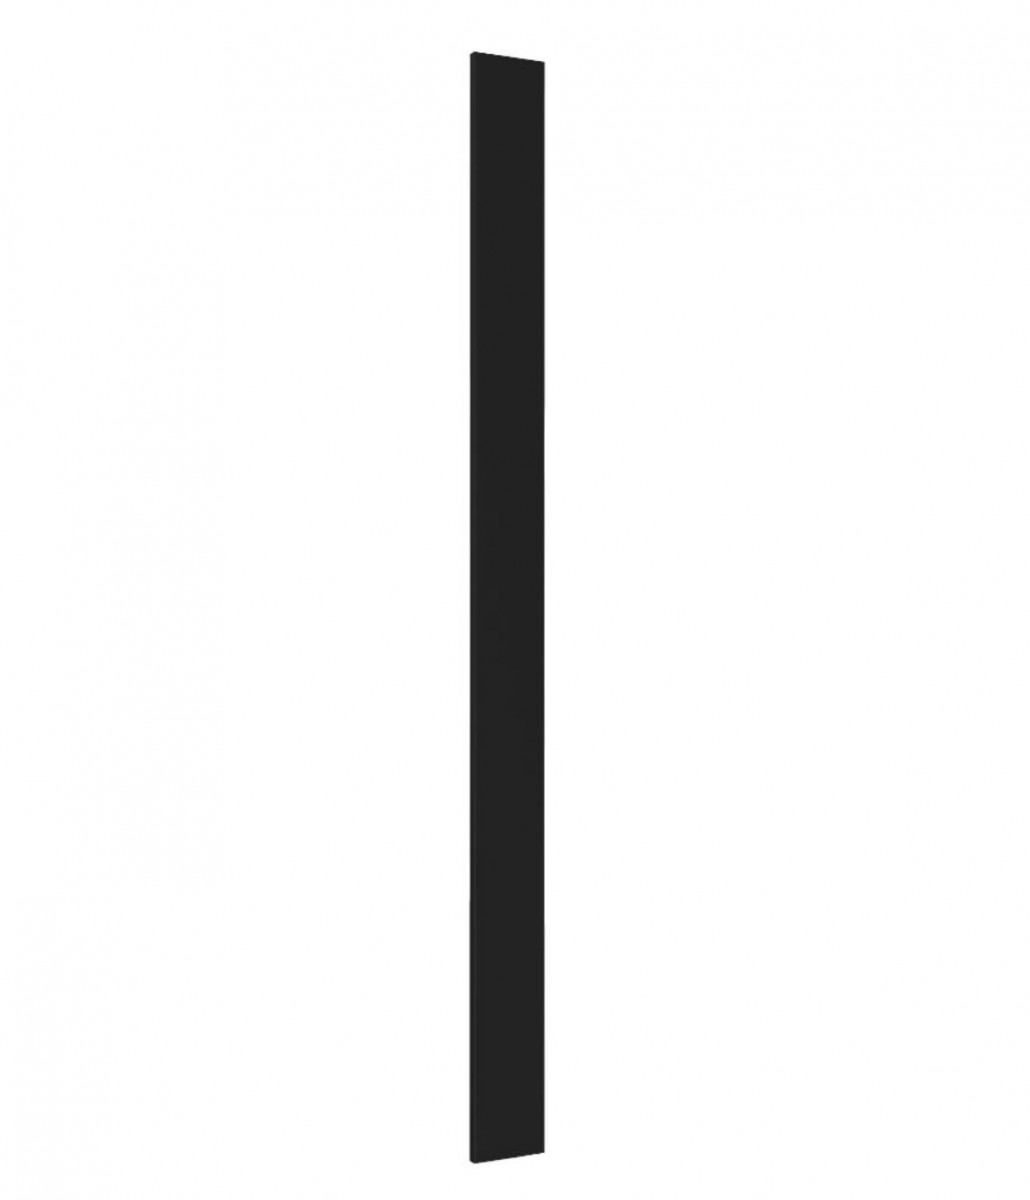 """ТЕХНО"" СПАЛЬНЯ. Паспарту вертикальное для шкафа (Любимый Дом)."